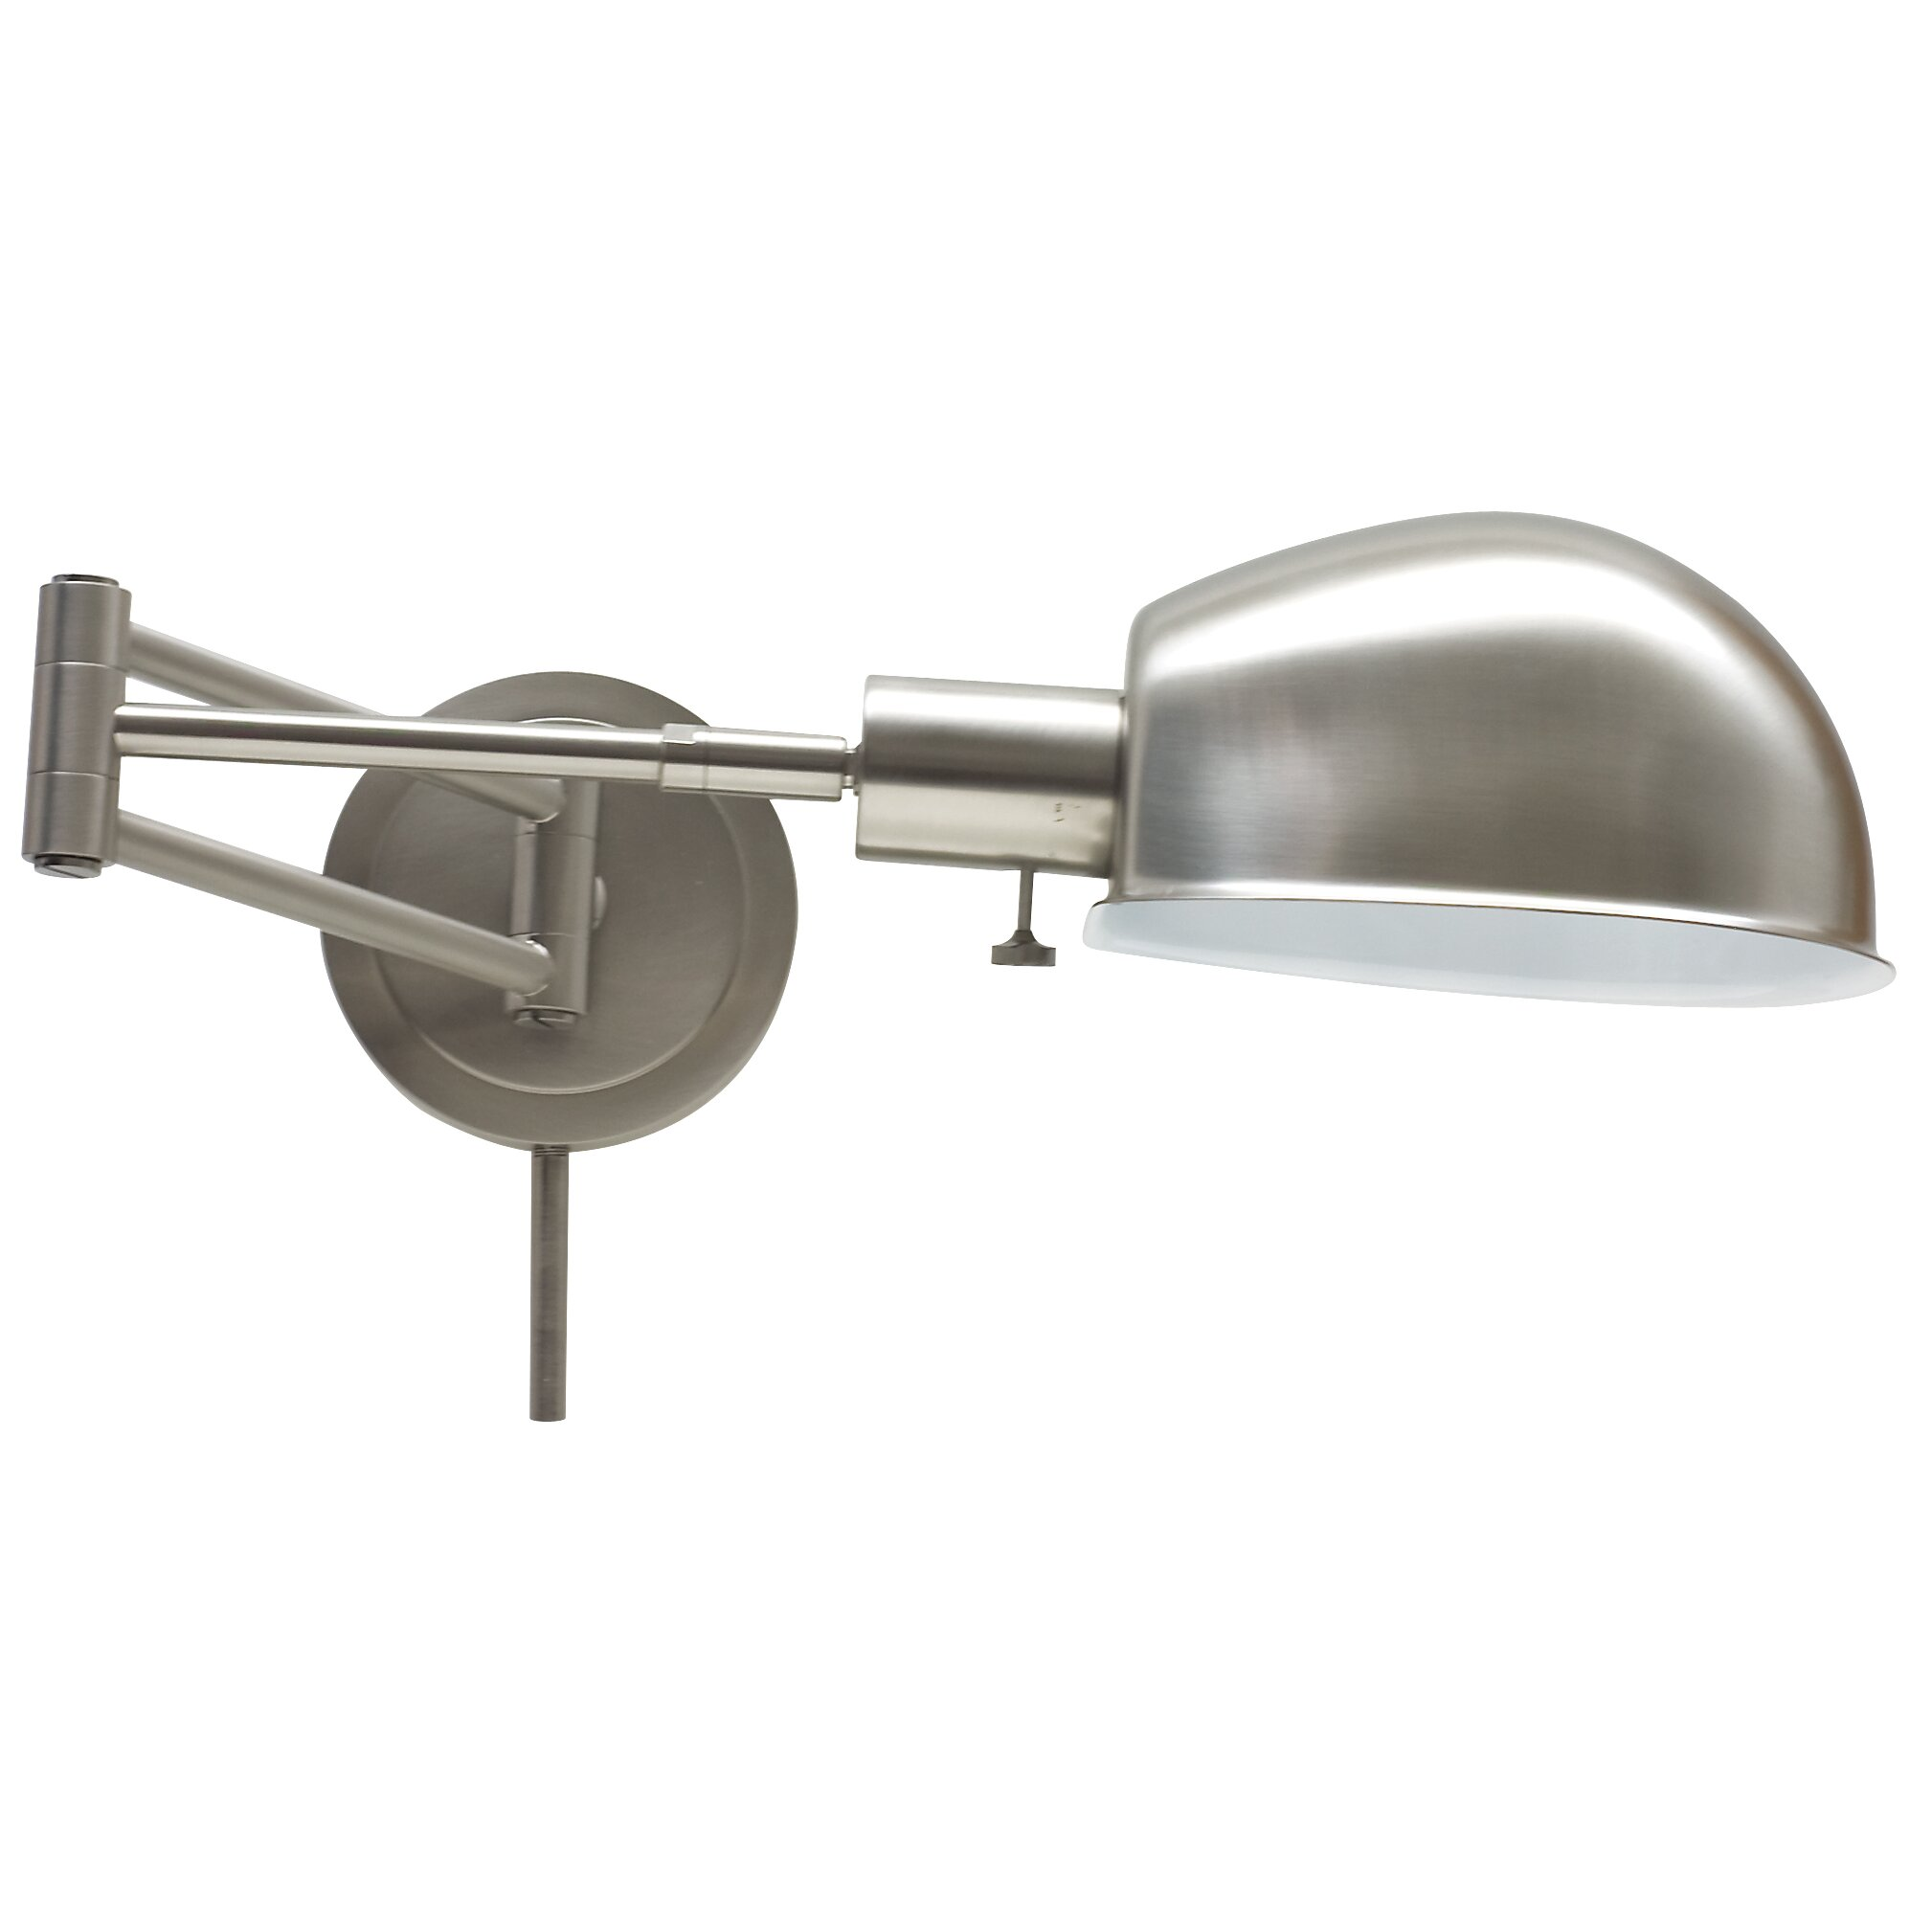 Wall Lamp Adjustable Arm : House of Troy Addison Adjustable Pharmacy Swing Arm Wall Lamp & Reviews Wayfair